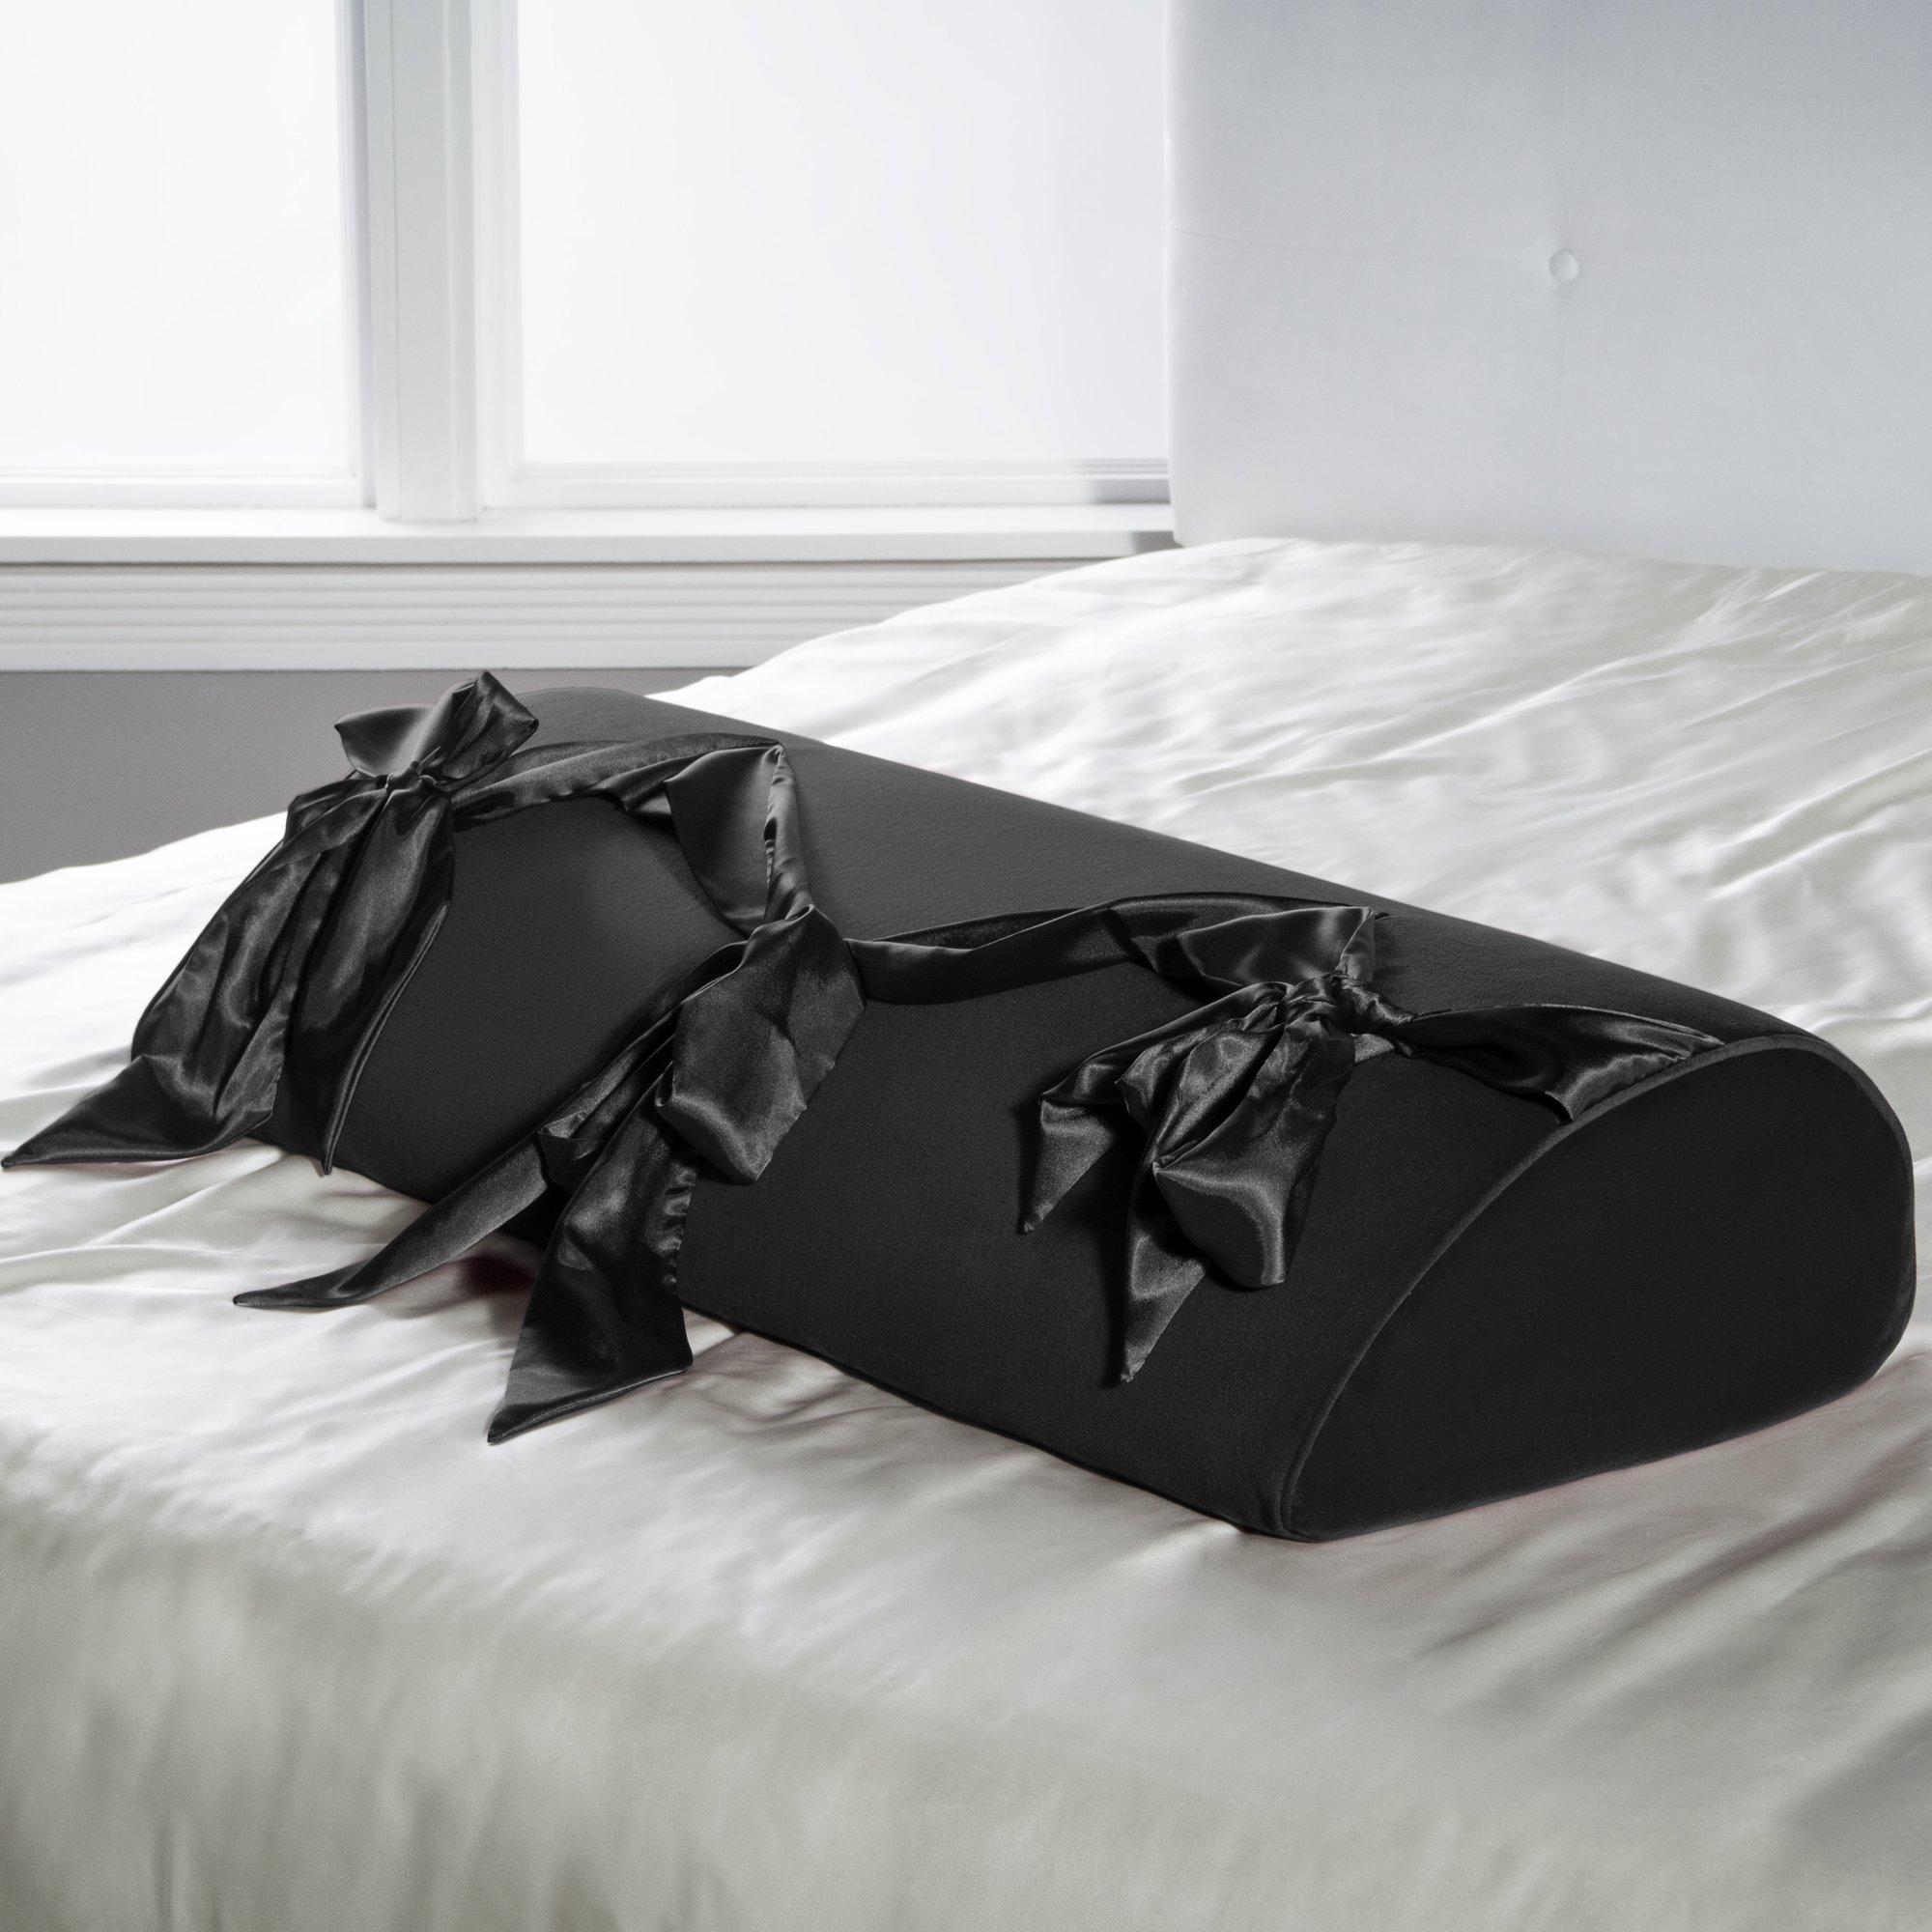 Liberator Decor Series Lovearts Pillow, Black by Liberator (Image #2)